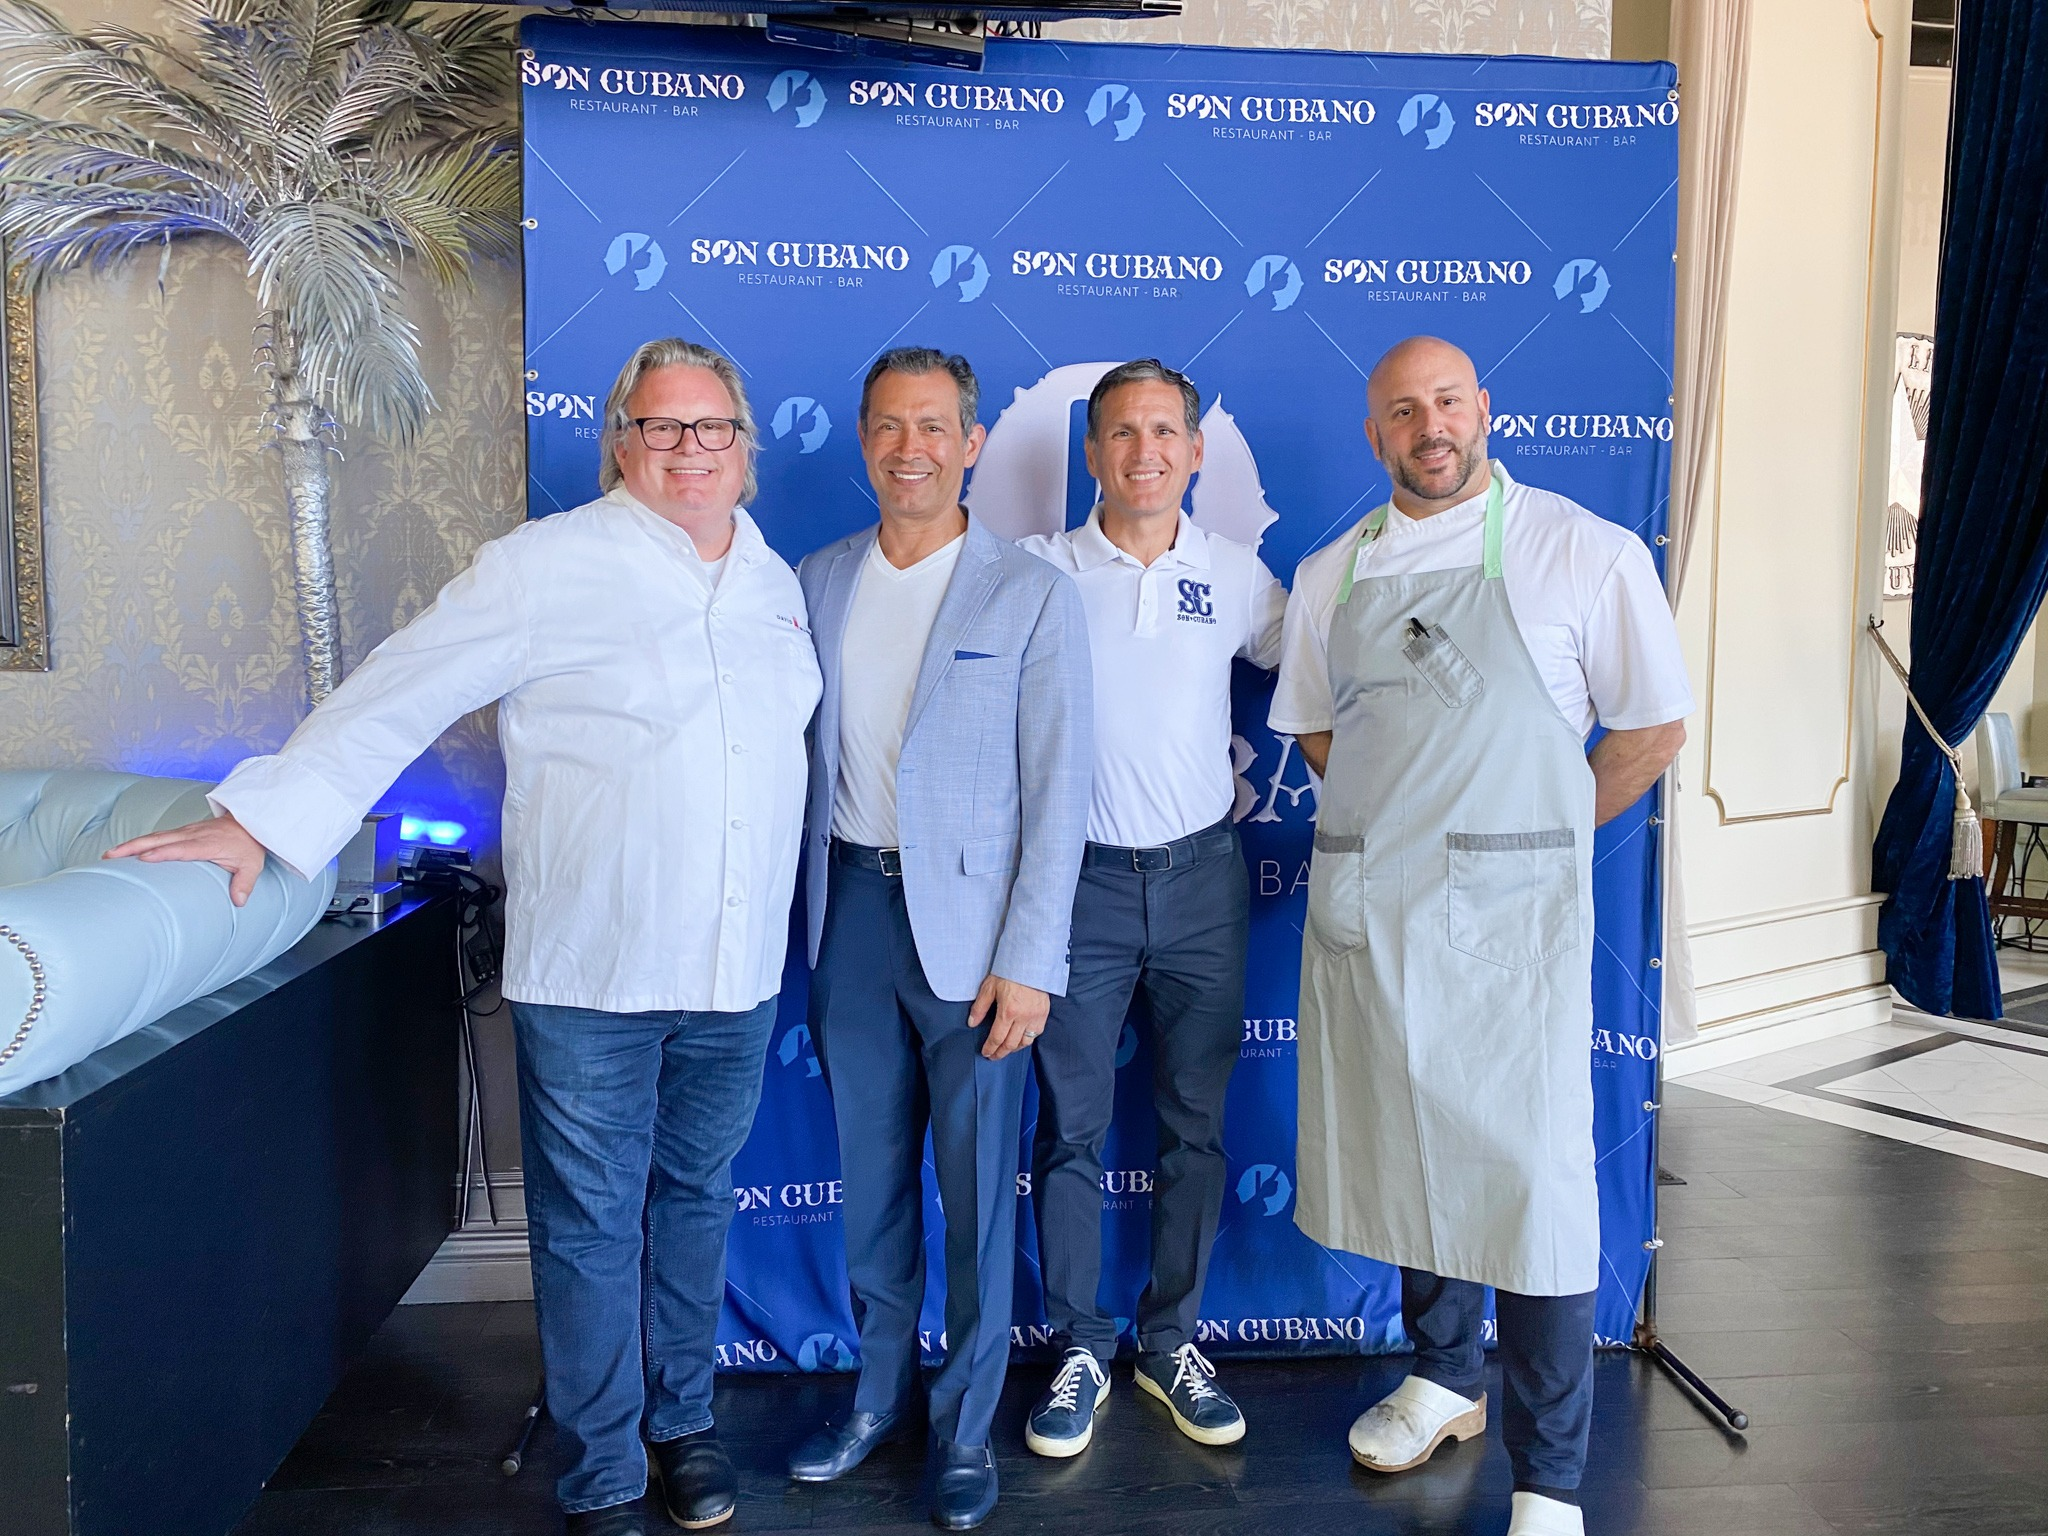 Chef David Burke New Culinary Director at Son Cubano